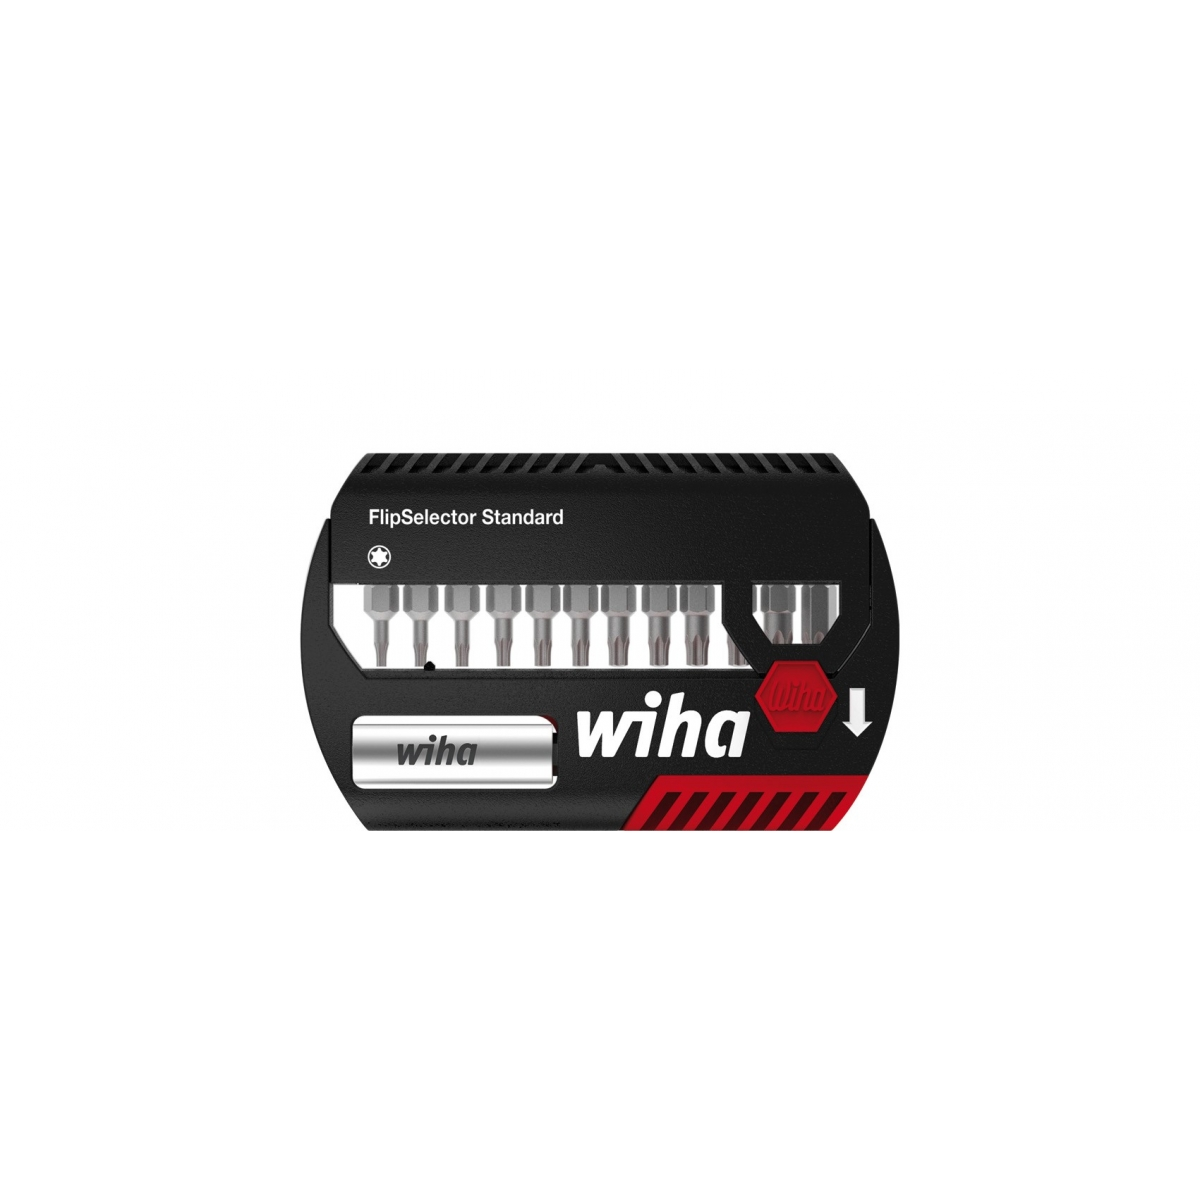 Zestaw bitów FlipSelector Standard 25 mm Wiha - 39056 Zestaw bitów FlipSelector Standard 25 mm Wiha - 39056